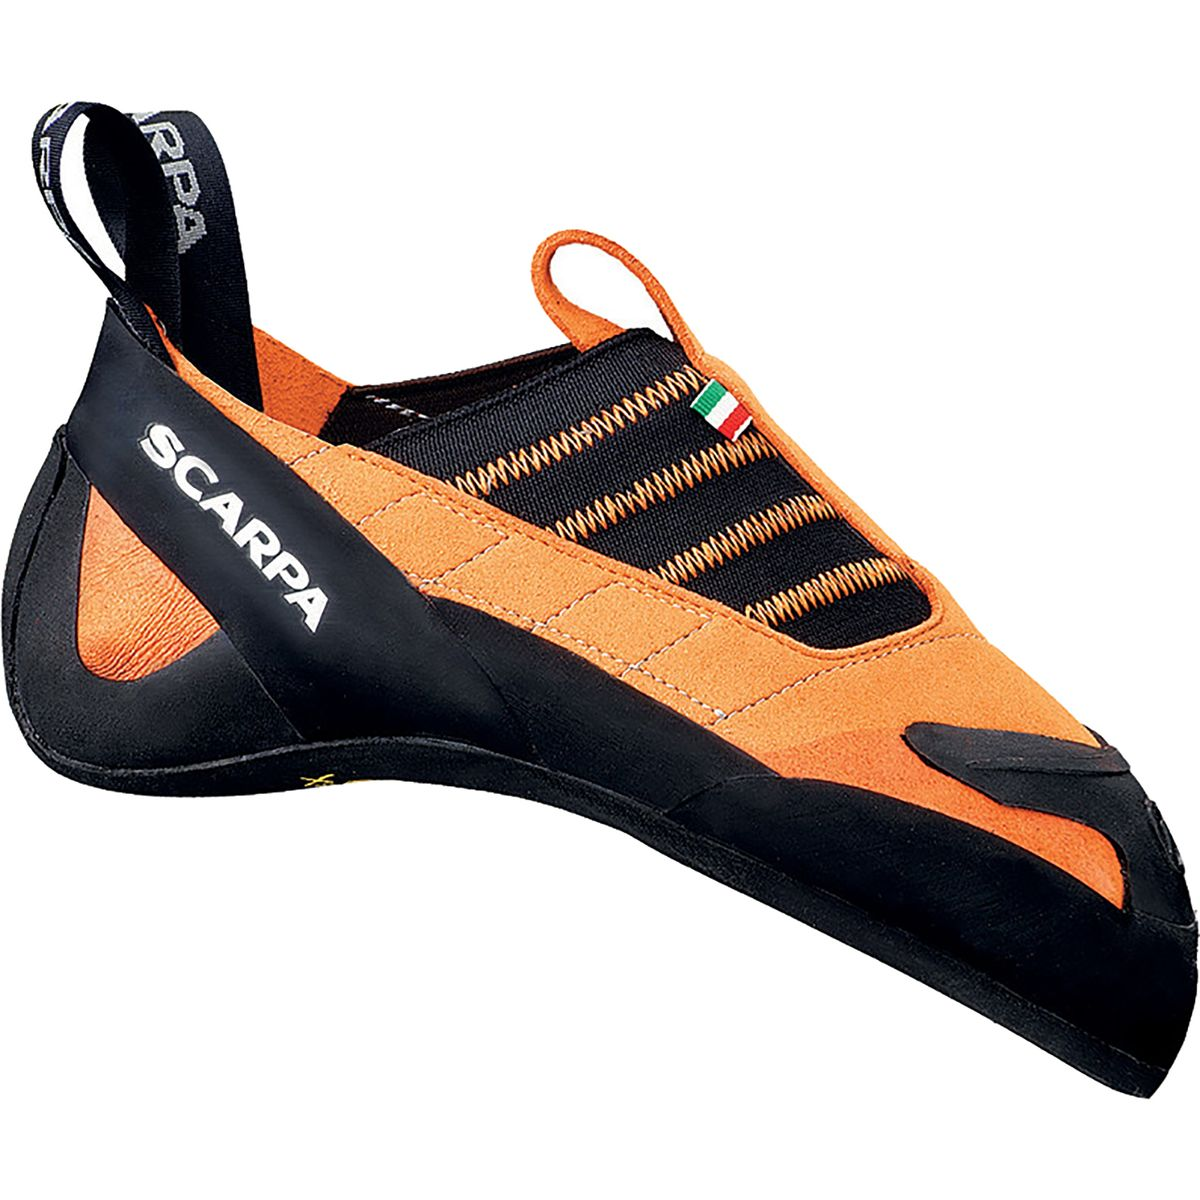 photo: Scarpa Instinct S climbing shoe